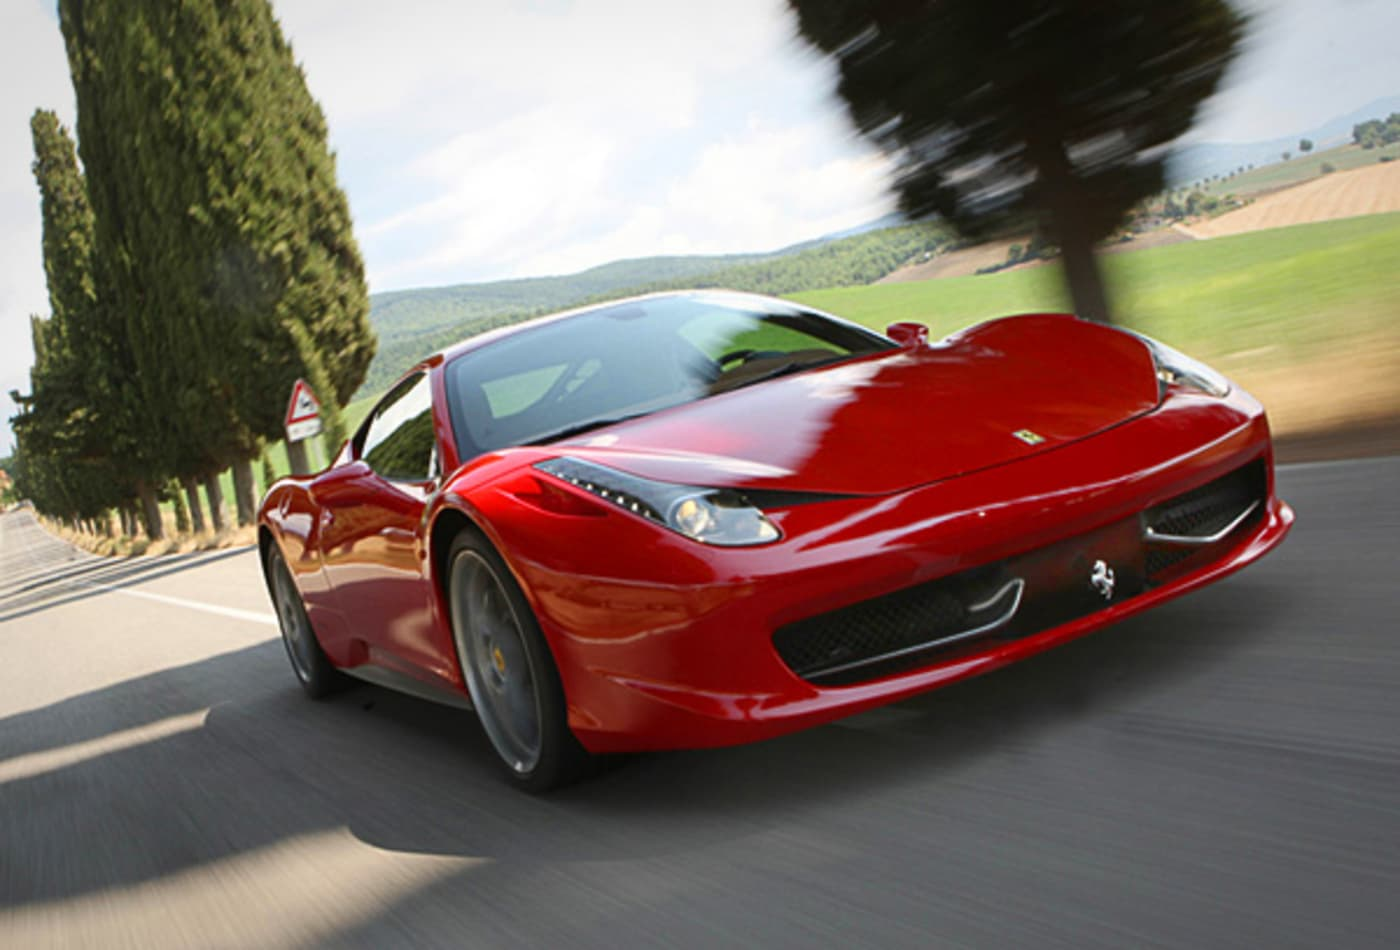 Ferrari-458-Italia-10-Fastest-Cars-2013-CNBC.jpg